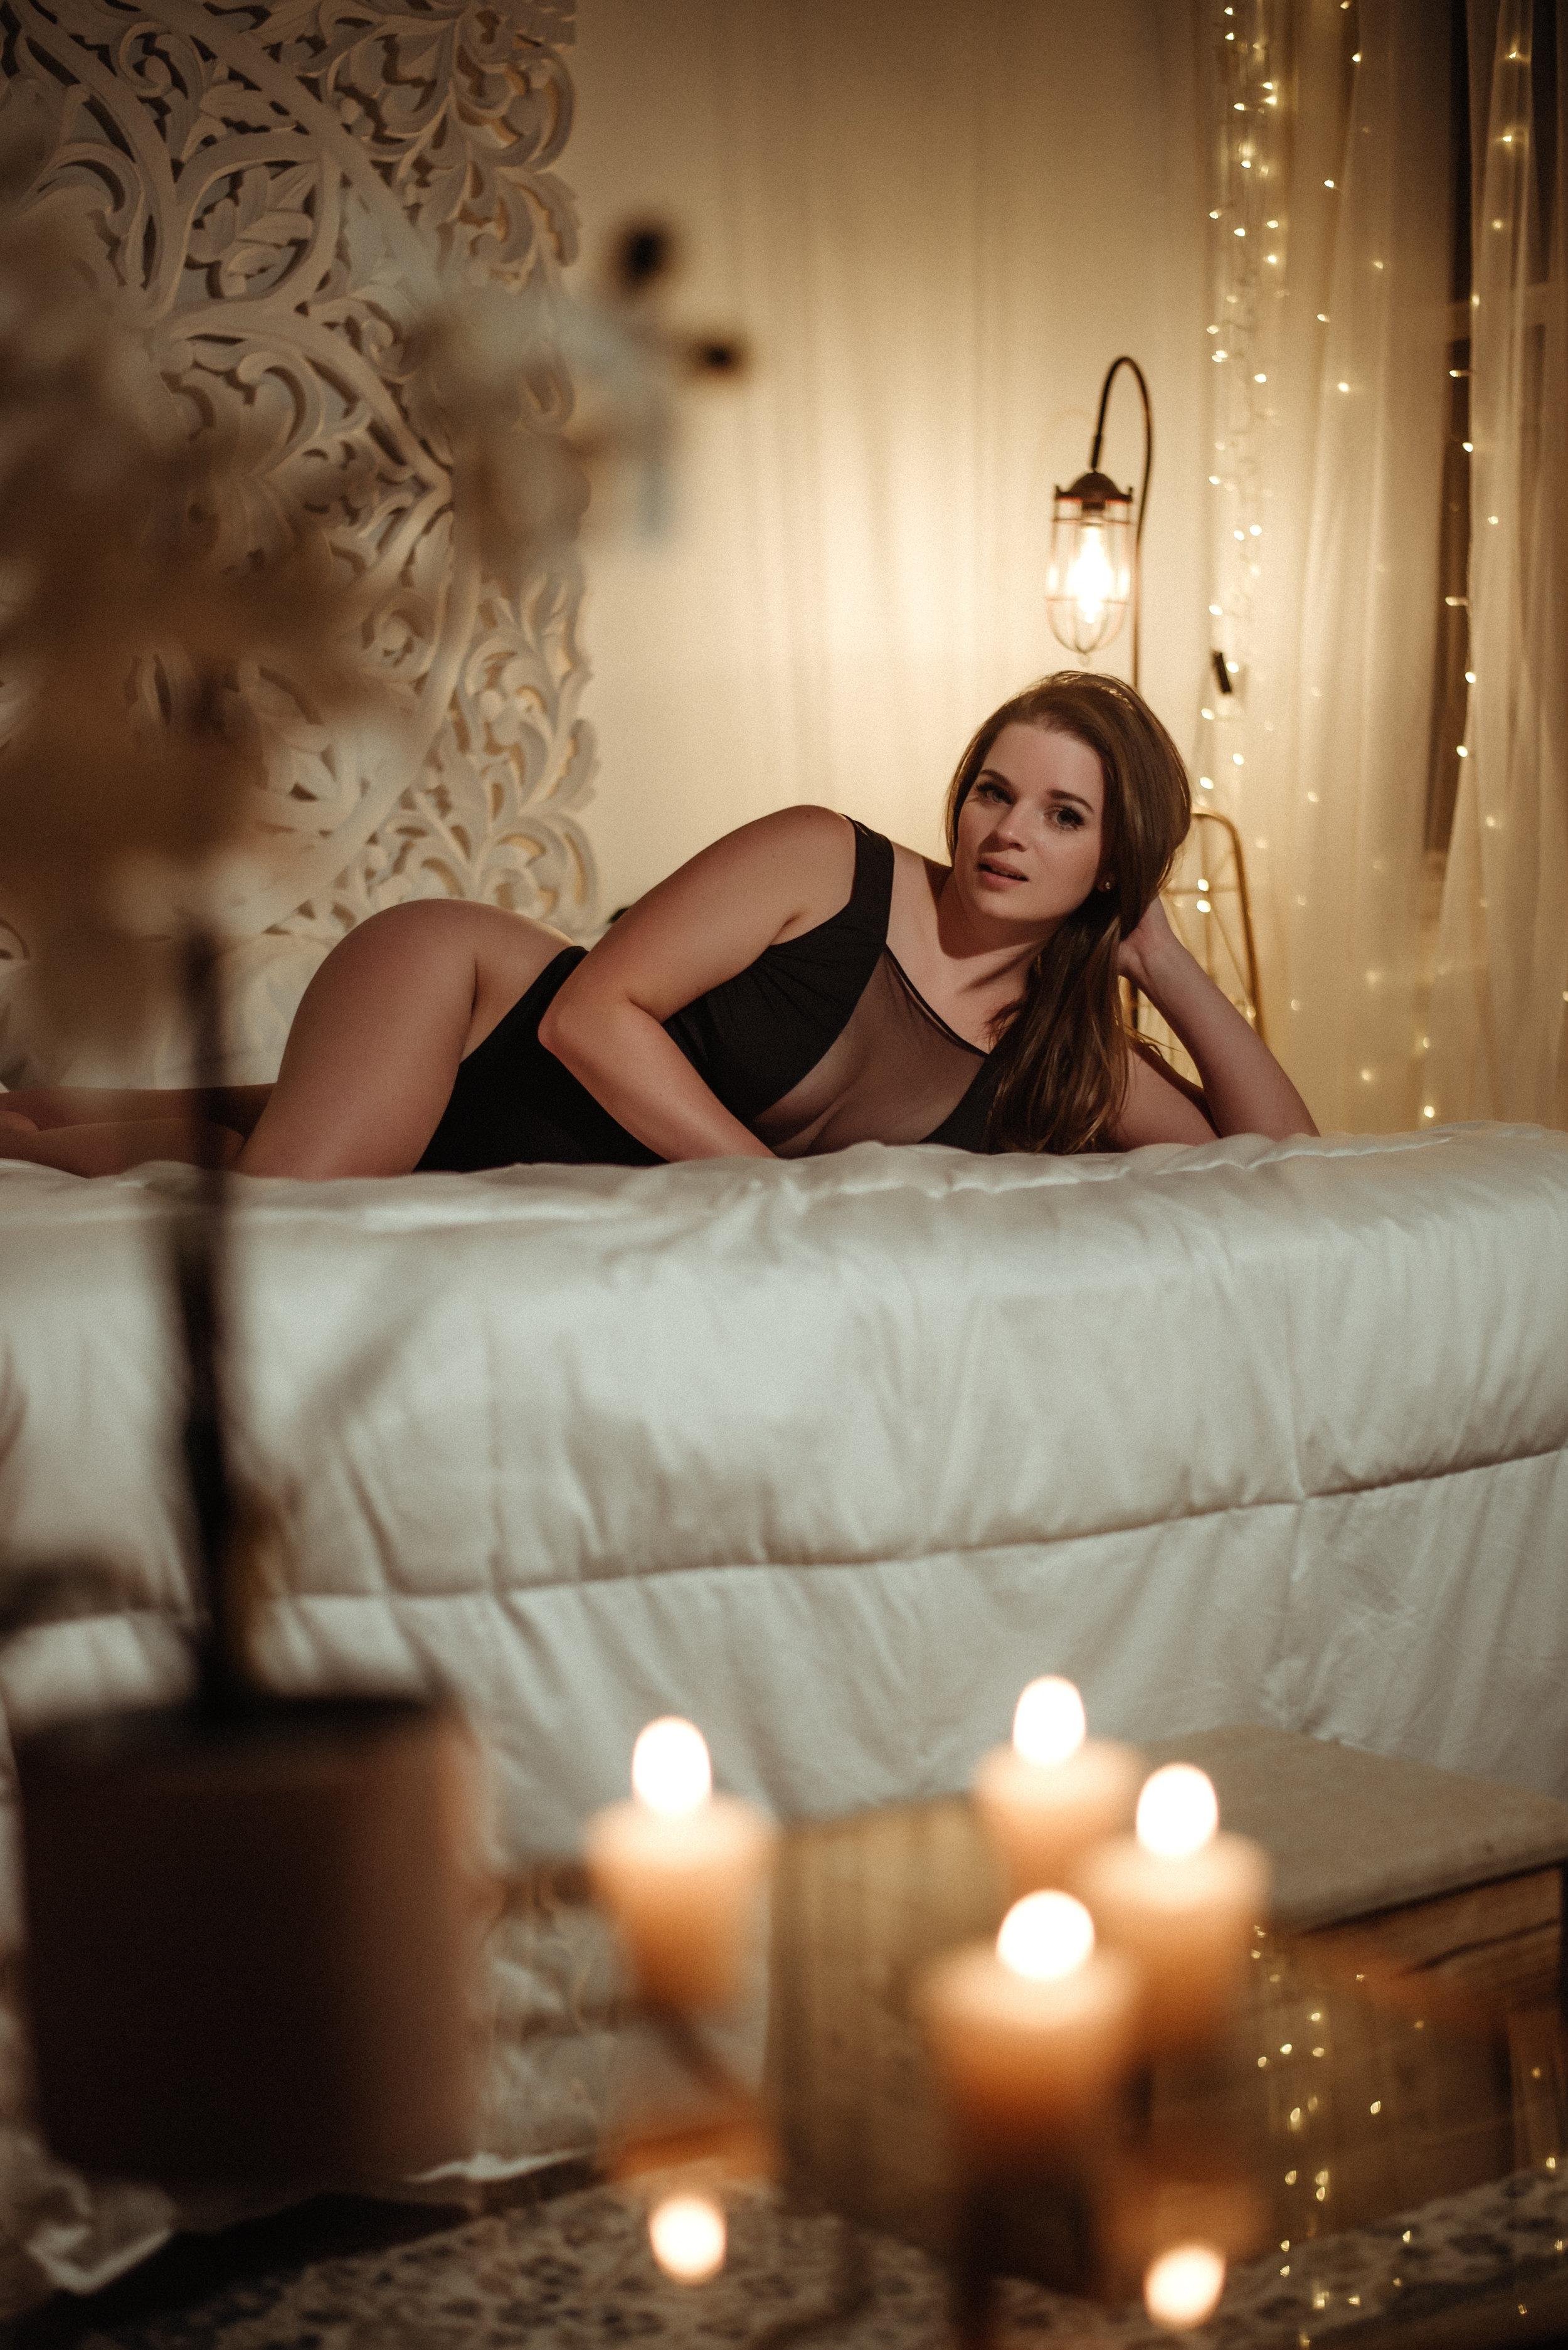 boudoir-photography-best-in-berks-19.jpg